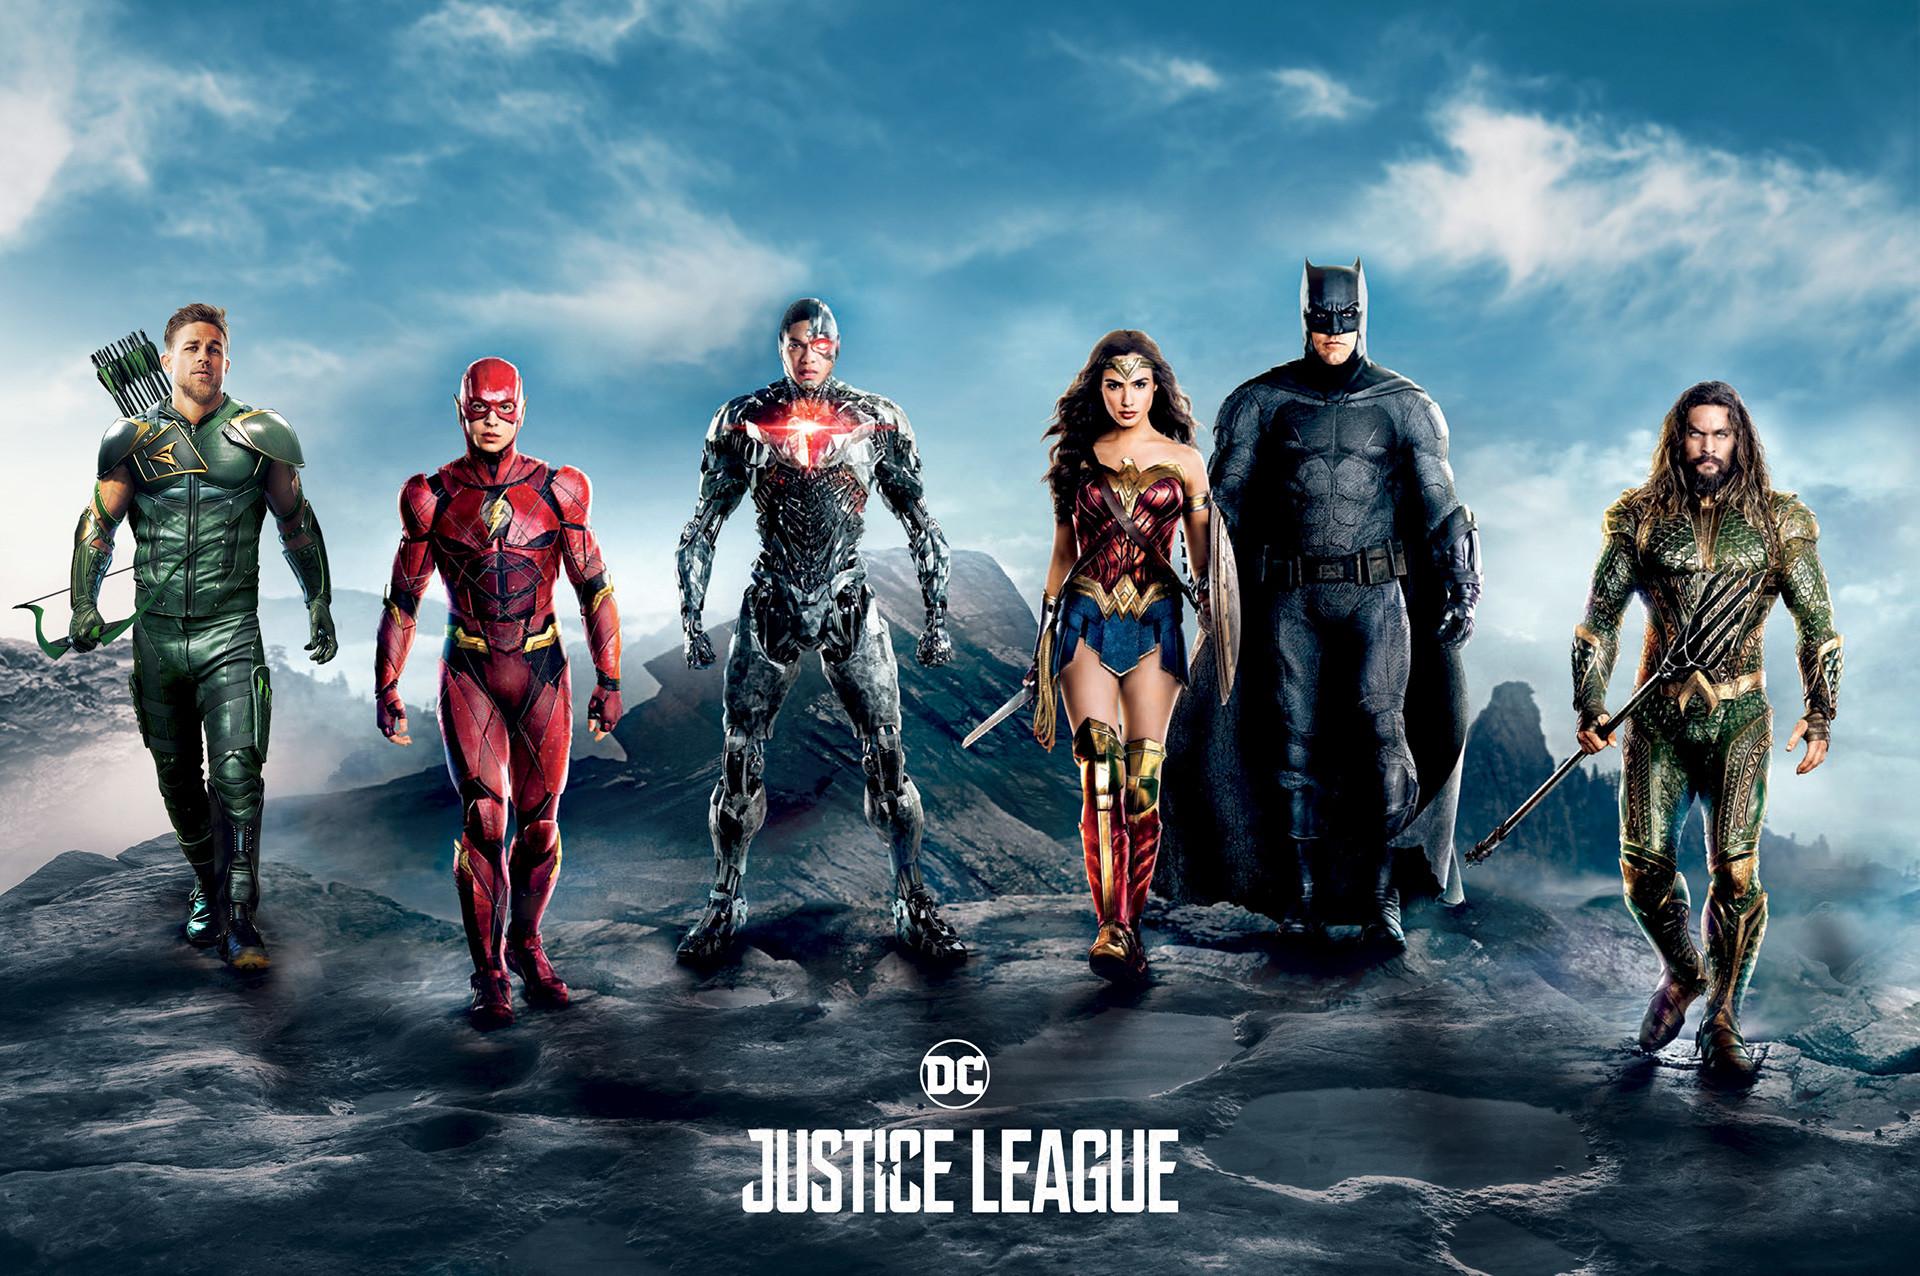 1920x1080 2017 justice league laptop full hd 1080p hd 4k